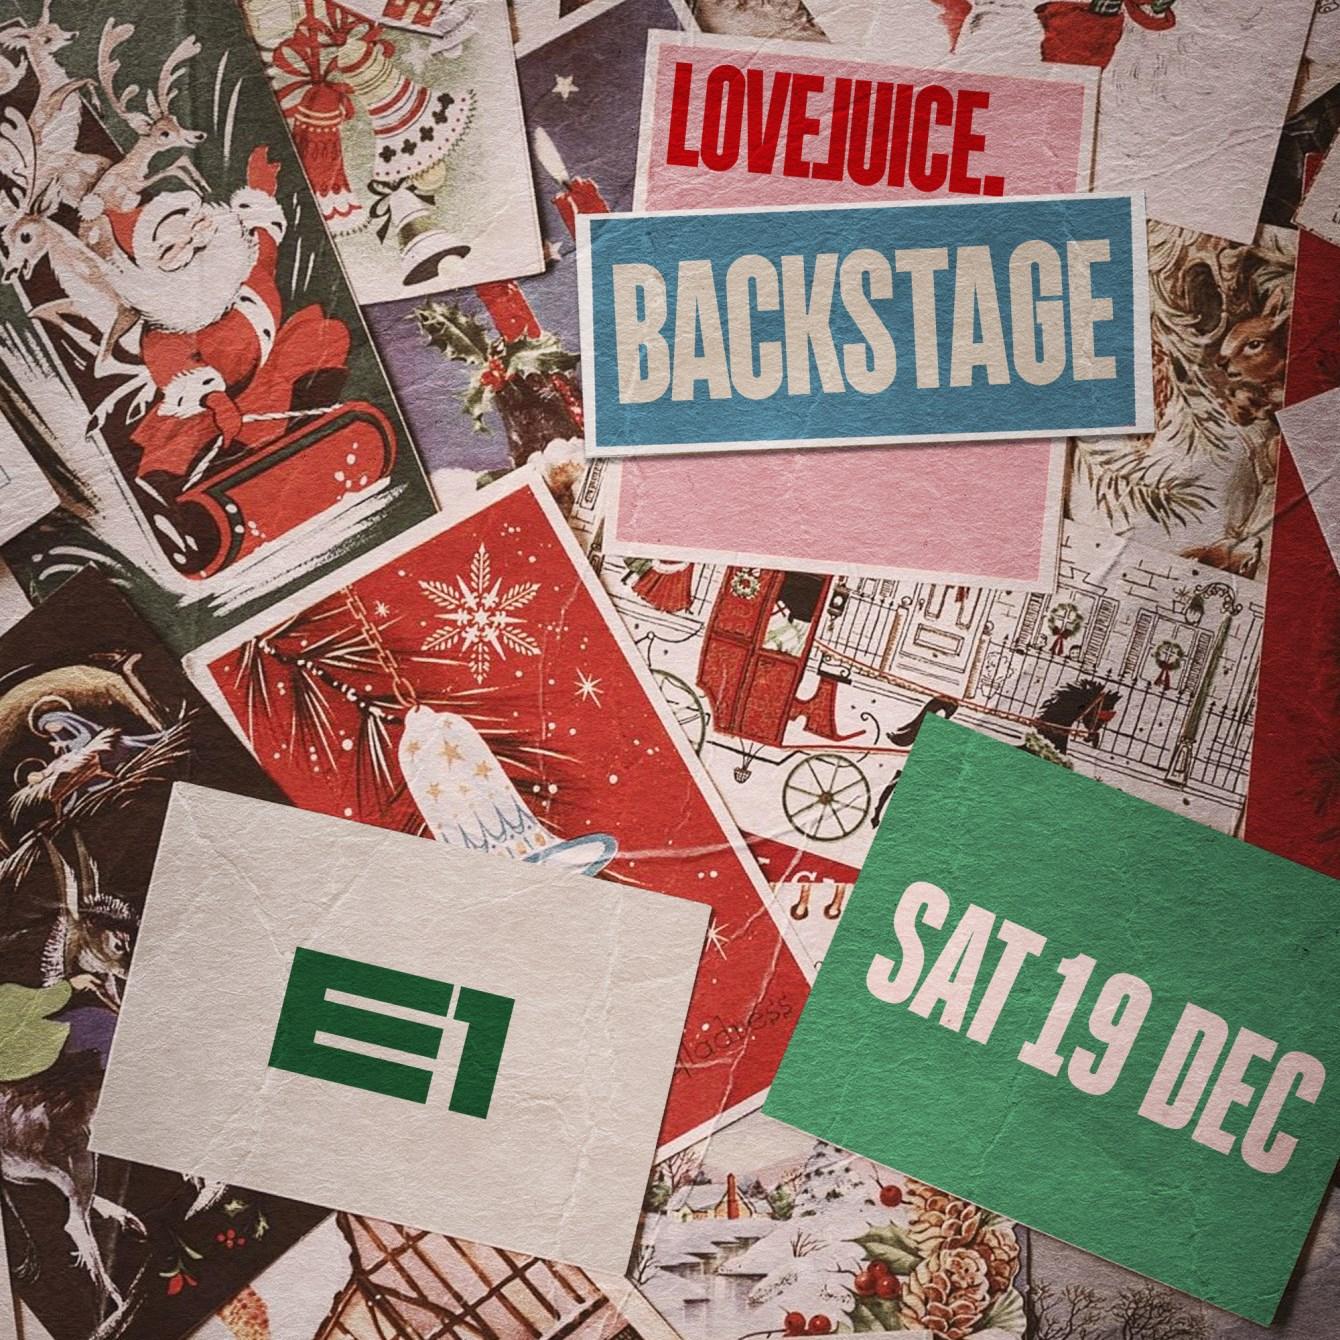 [RESCHEDULED] LoveJuice Backstage - Sat 19th Dec 2020 - Flyer front